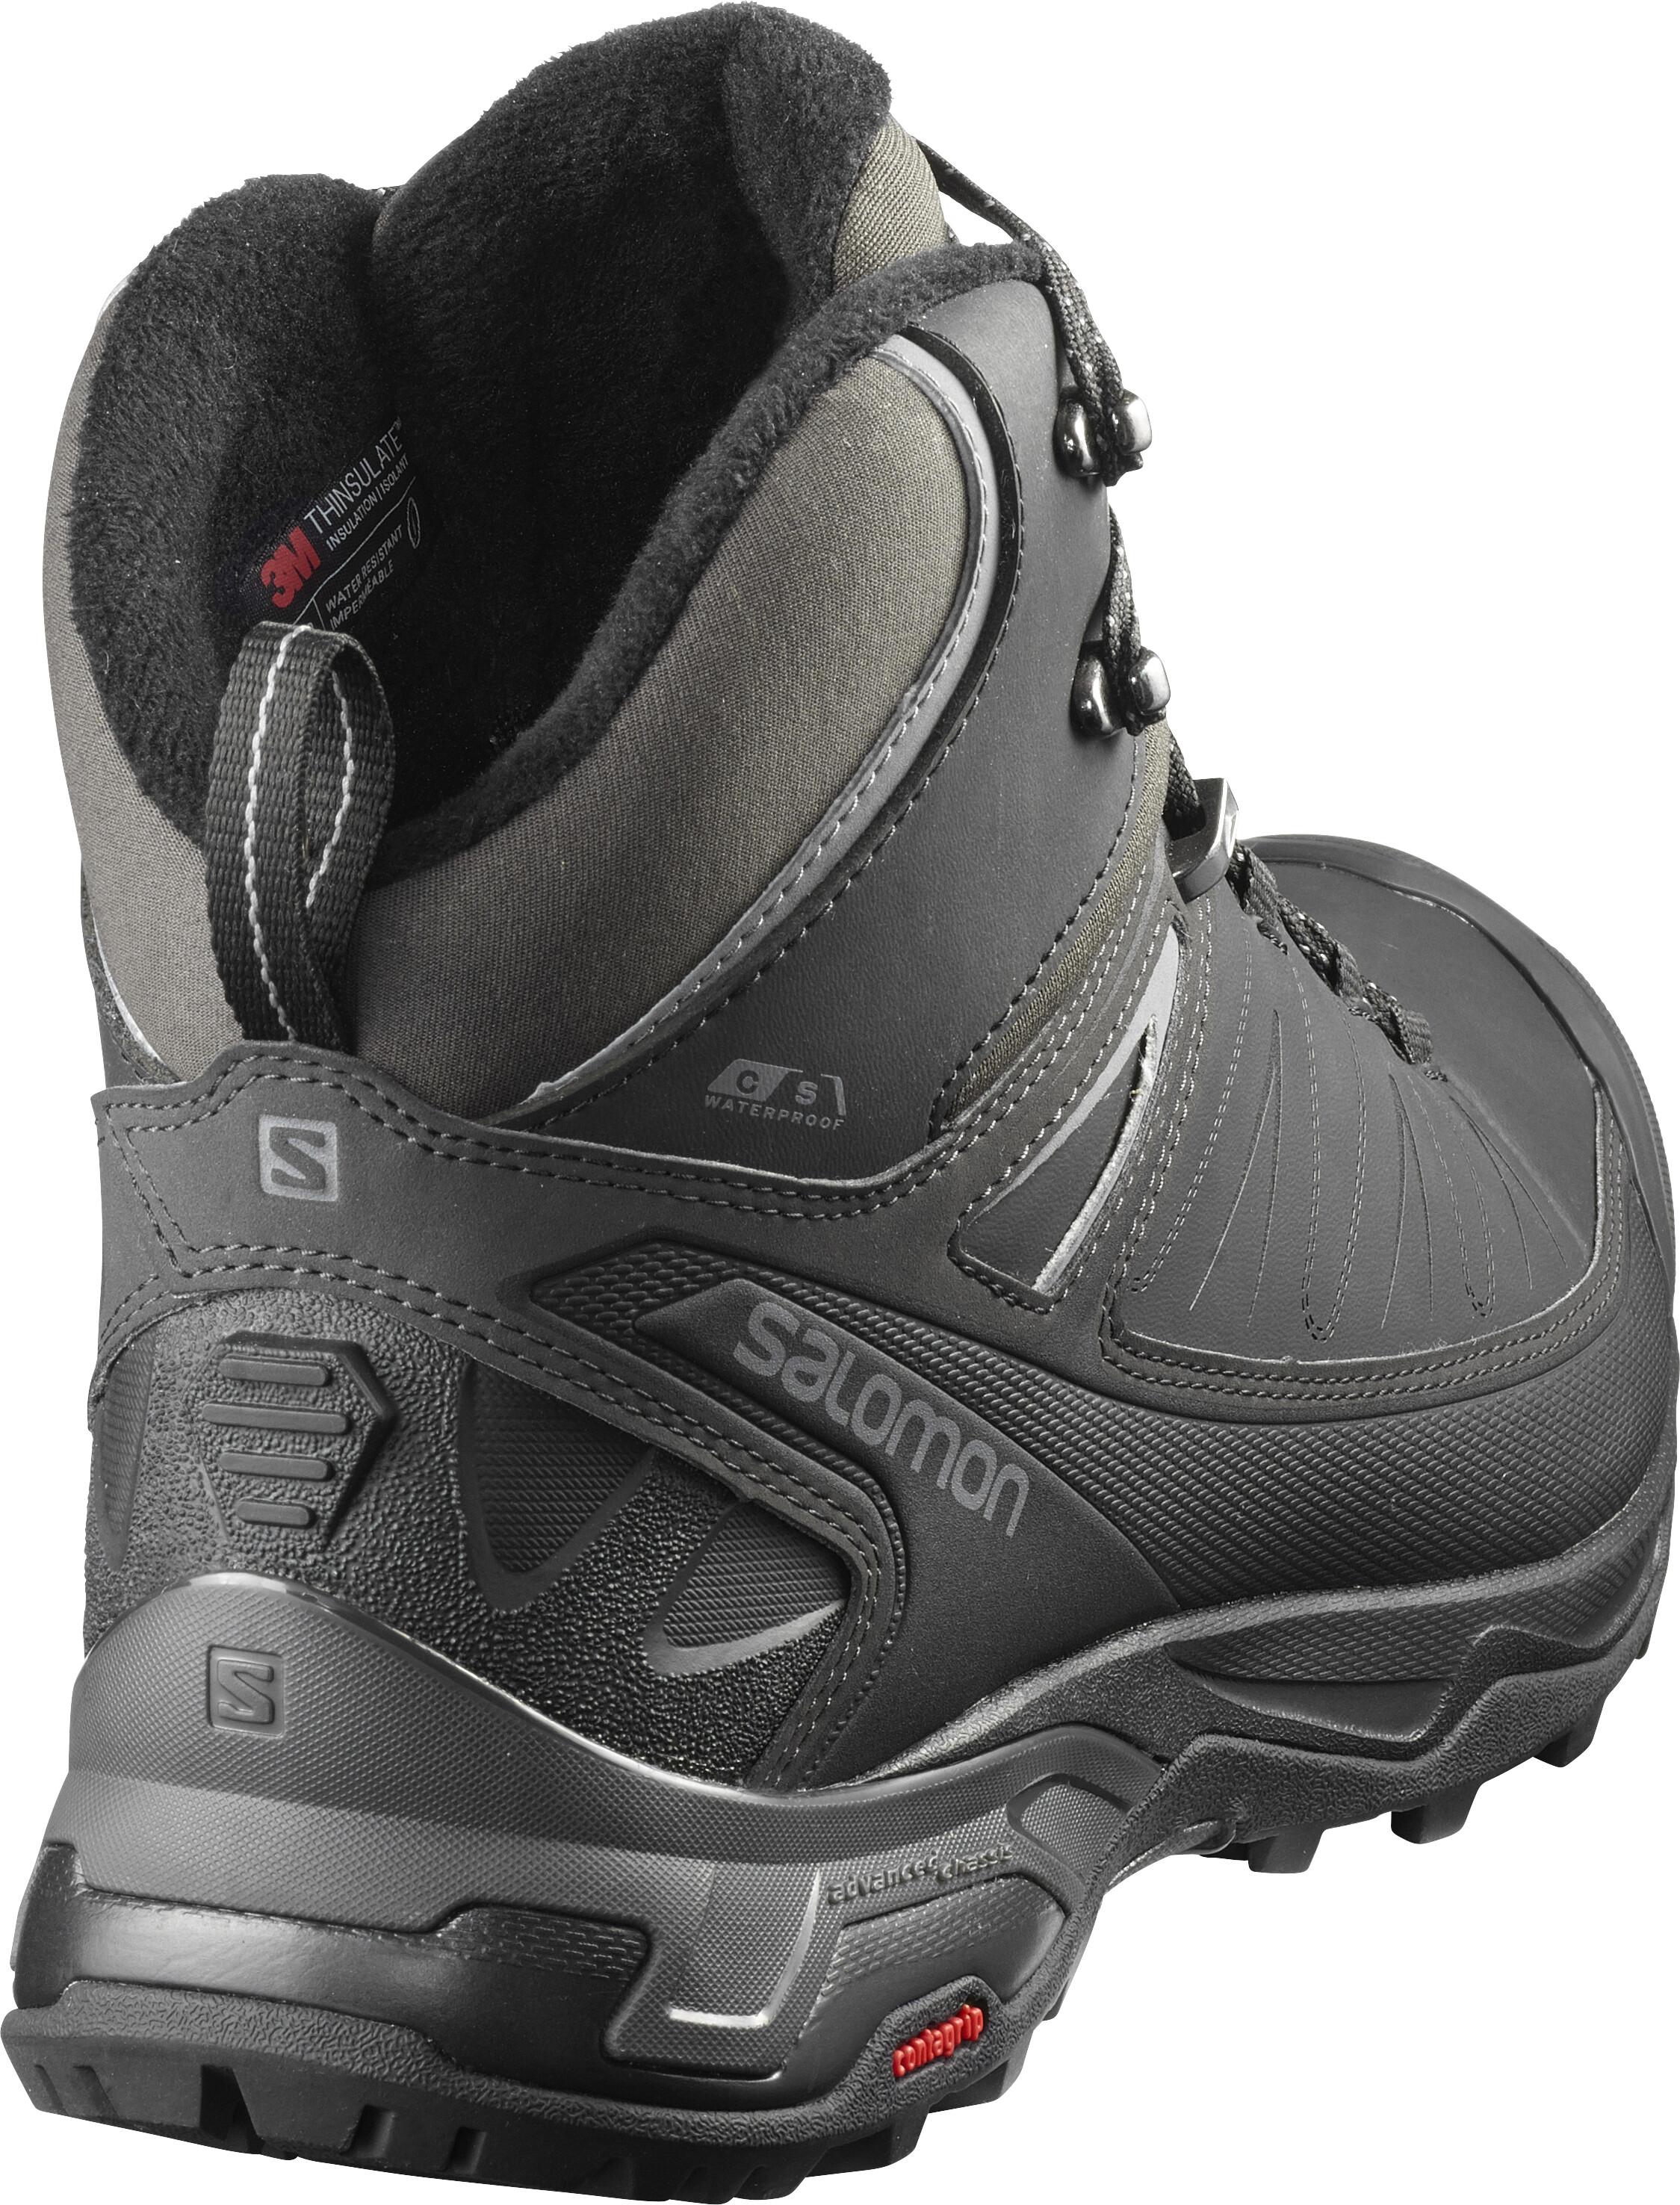 Salomon X Ultra Mid CS WP Shoes Men black at Addnature.co.uk 111c824fc5